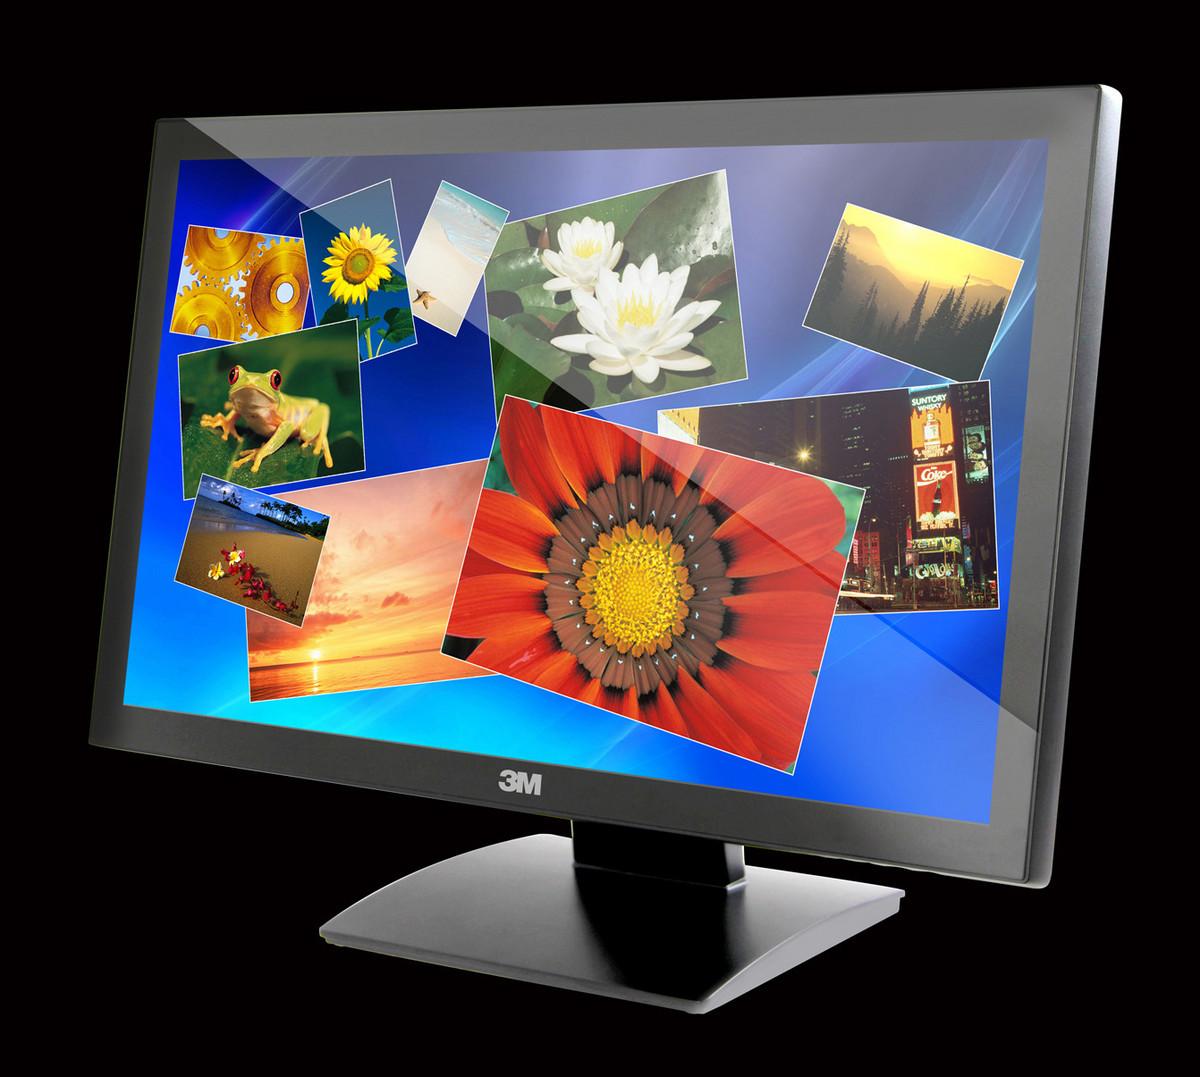 Illustration 12: PCAP - Flat Front Surface oder virtuelle Einfassung